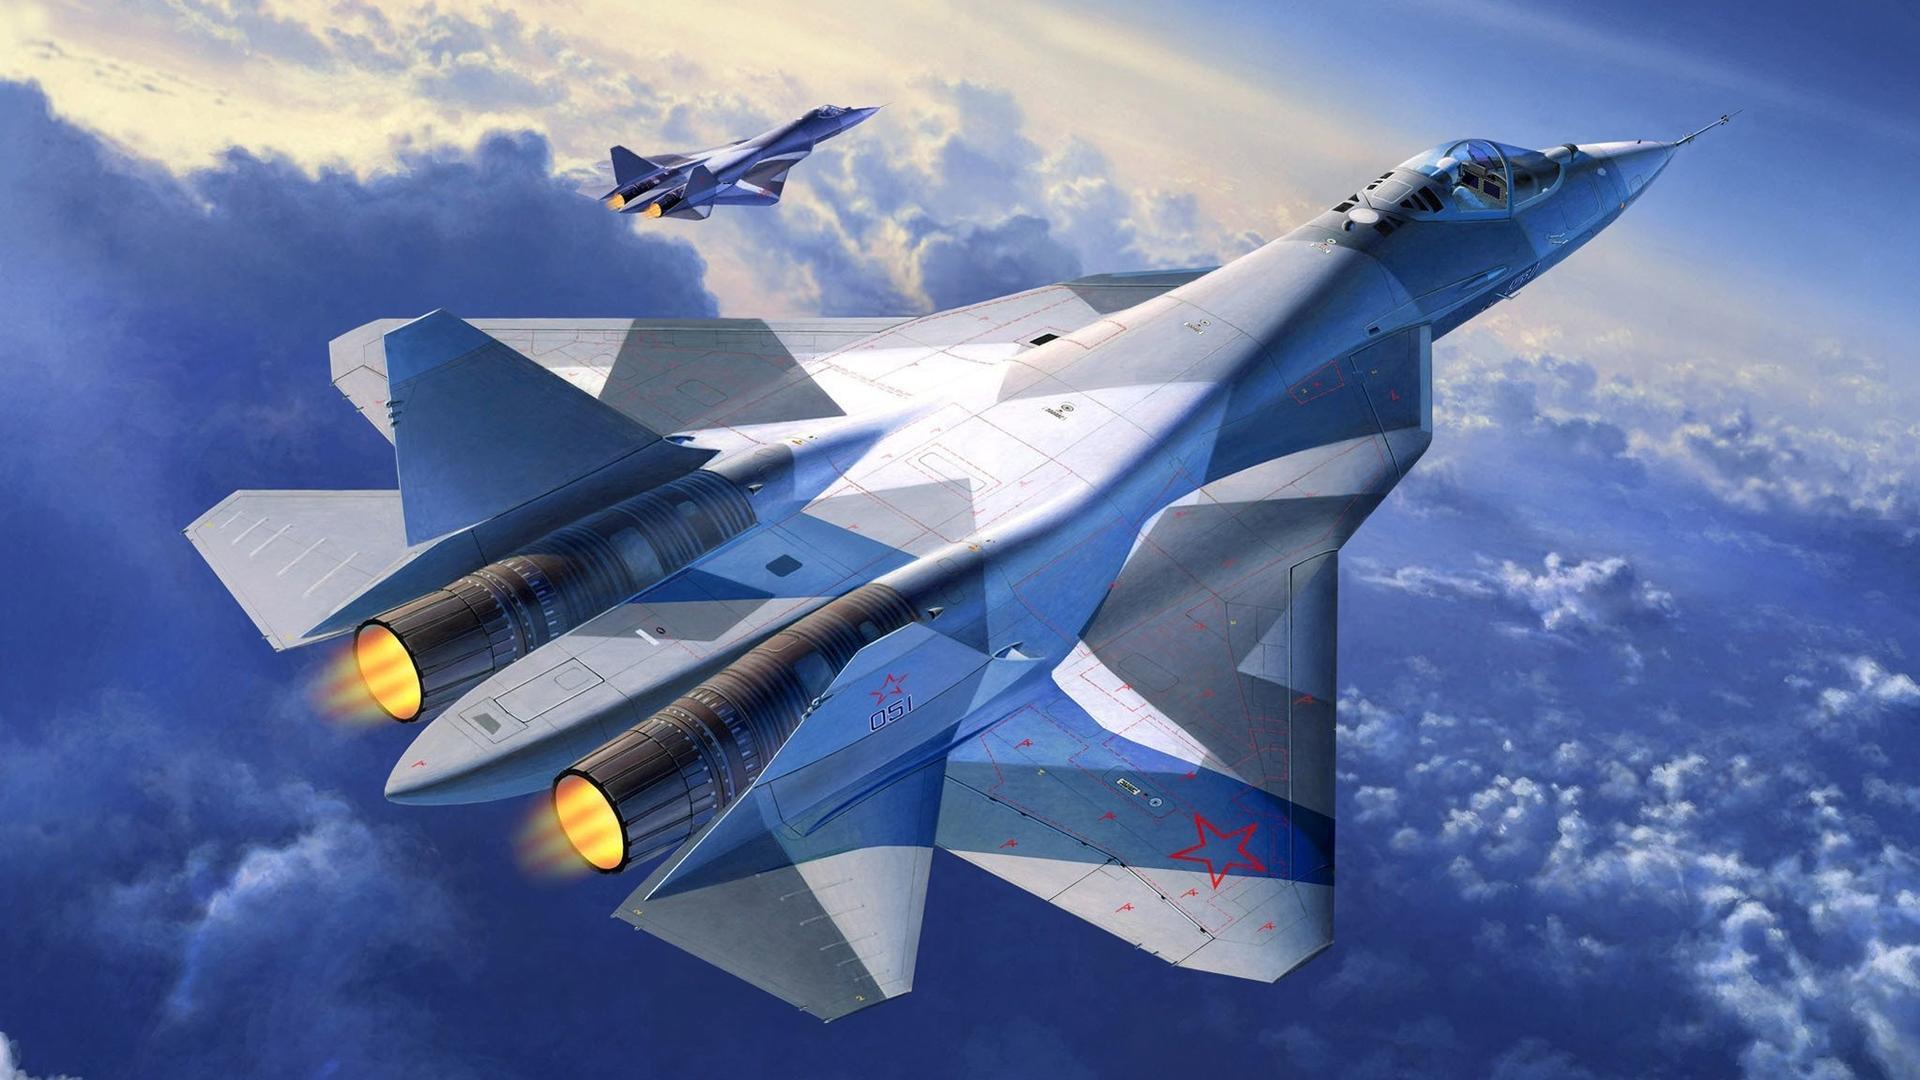 Обои летит, синее небо, F-15E, небо, боевой самолет. Авиация foto 14